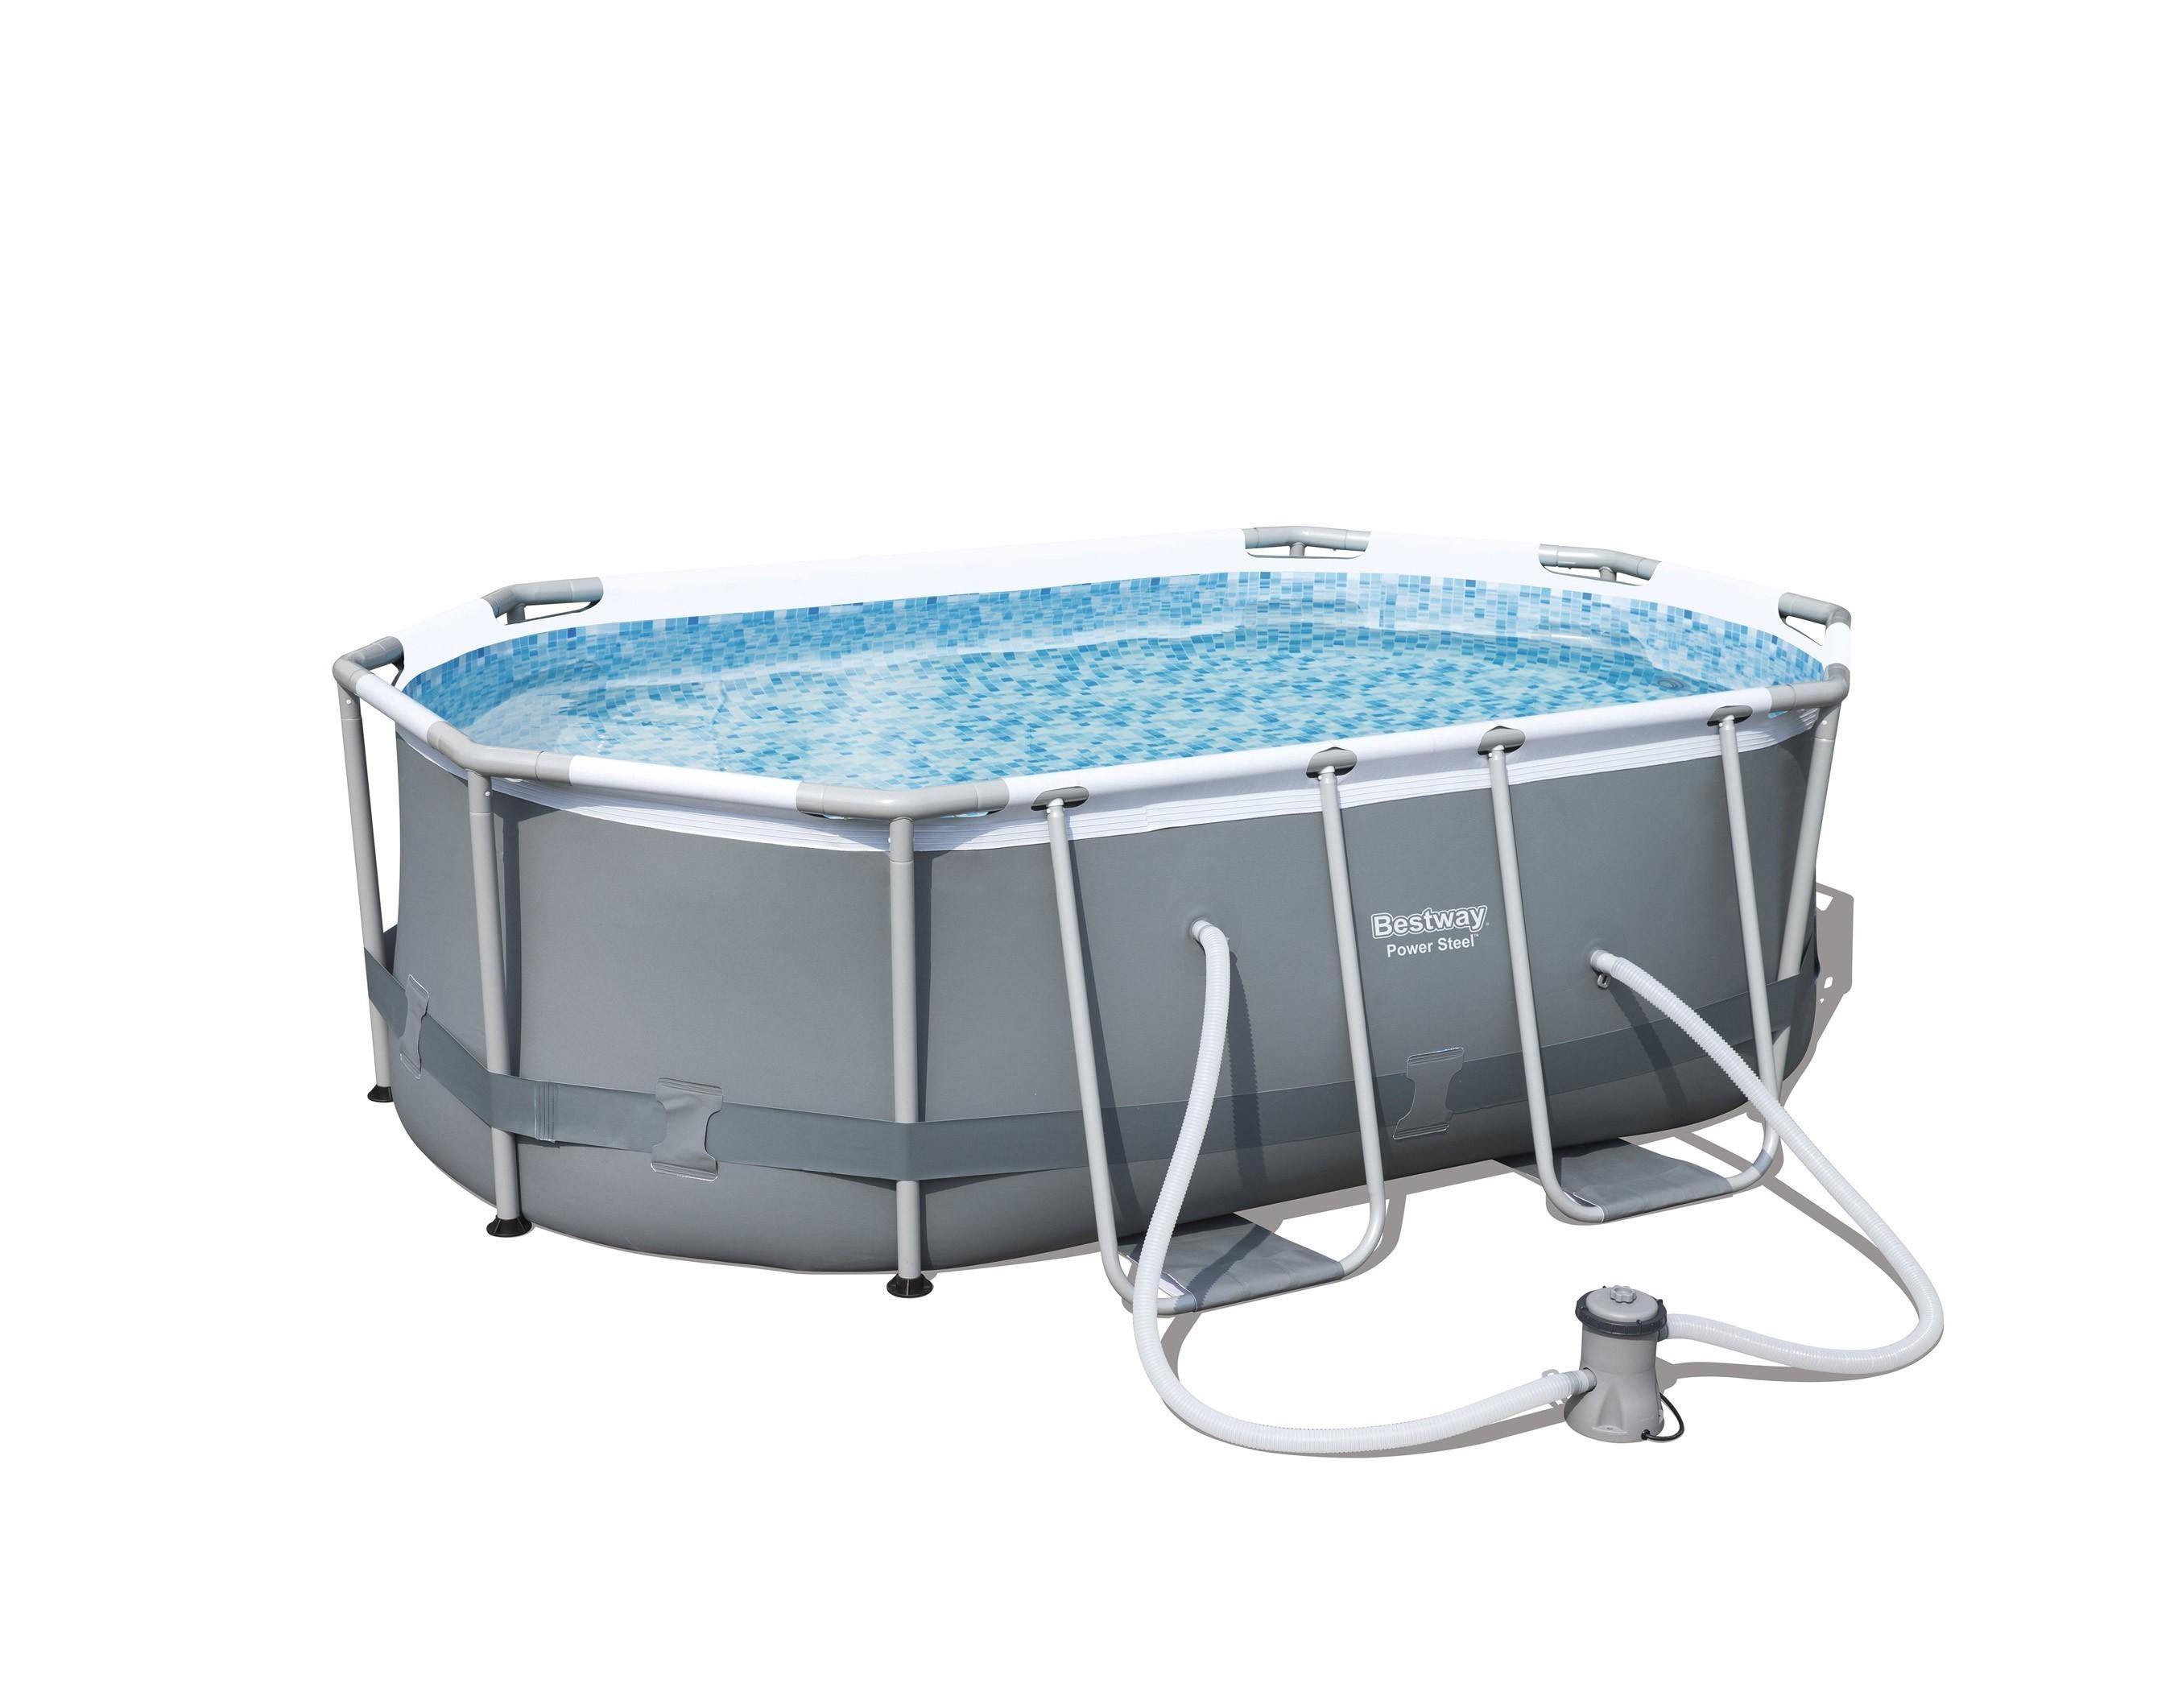 Pool / Frame Pool Bestway Power Steel Oval Set Filterpumpe 300x200x84 Bild 1